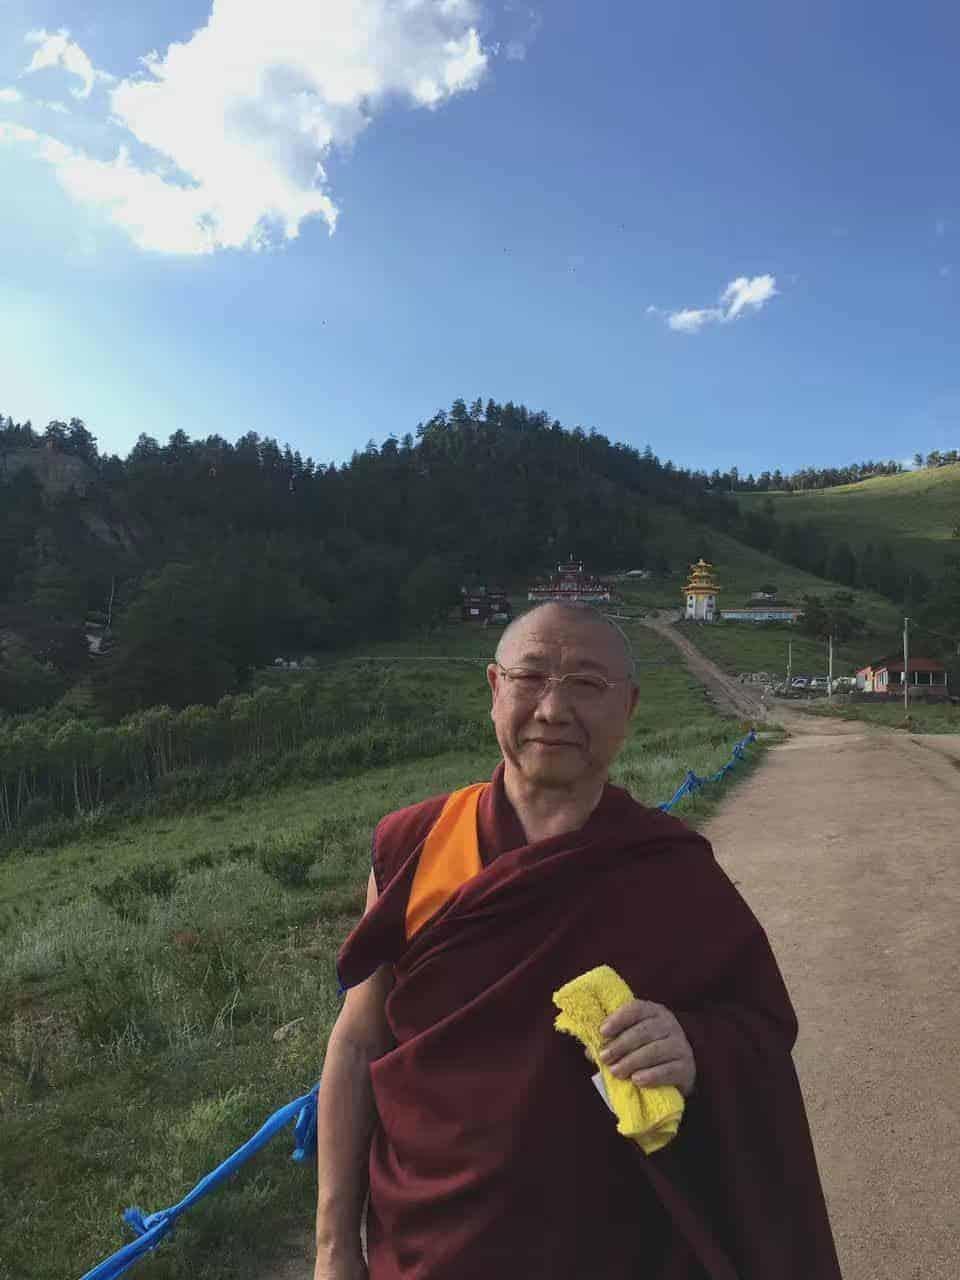 gosok-rinpoche-mongolia-2016-8eea4c8d507307fc073c9851ecbf414